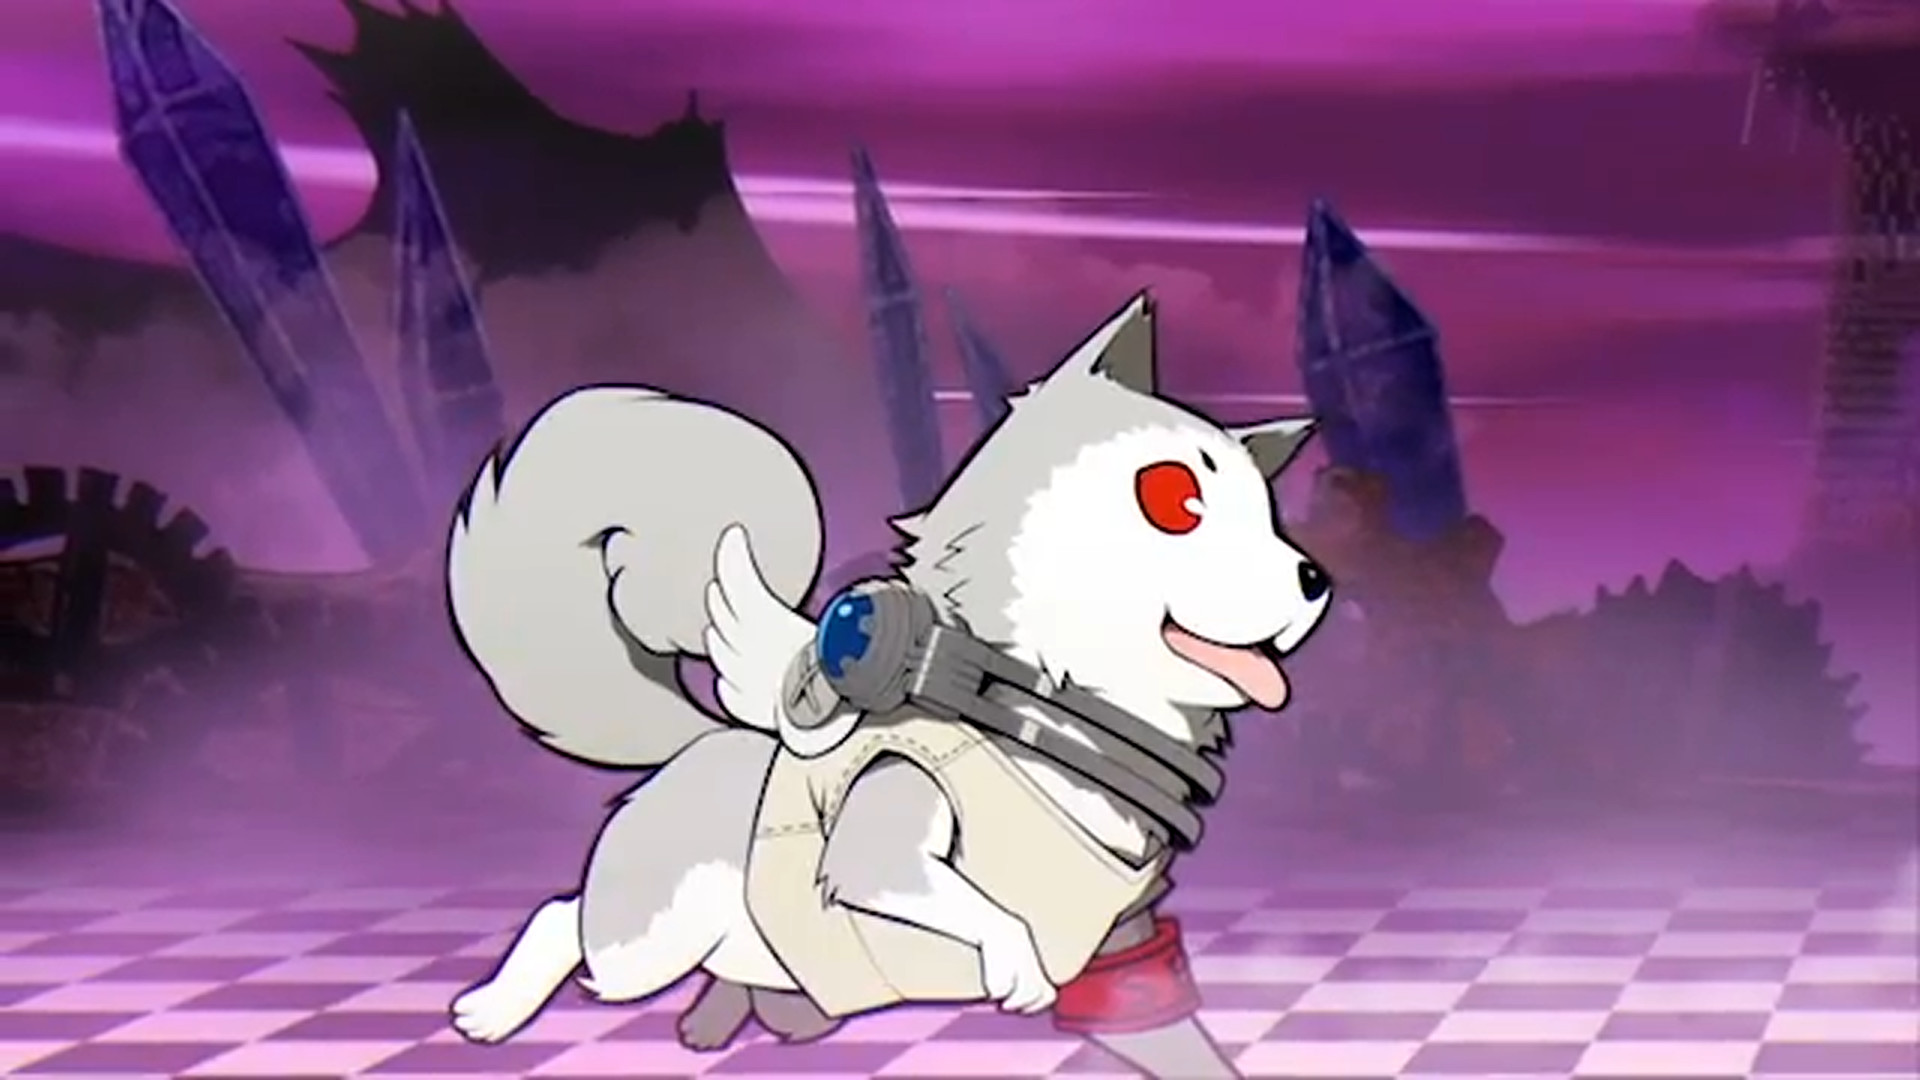 Kanji the Sensitive Bruiser and Loyal Canine Koromaru Star in Two New Persona  Q Trailers